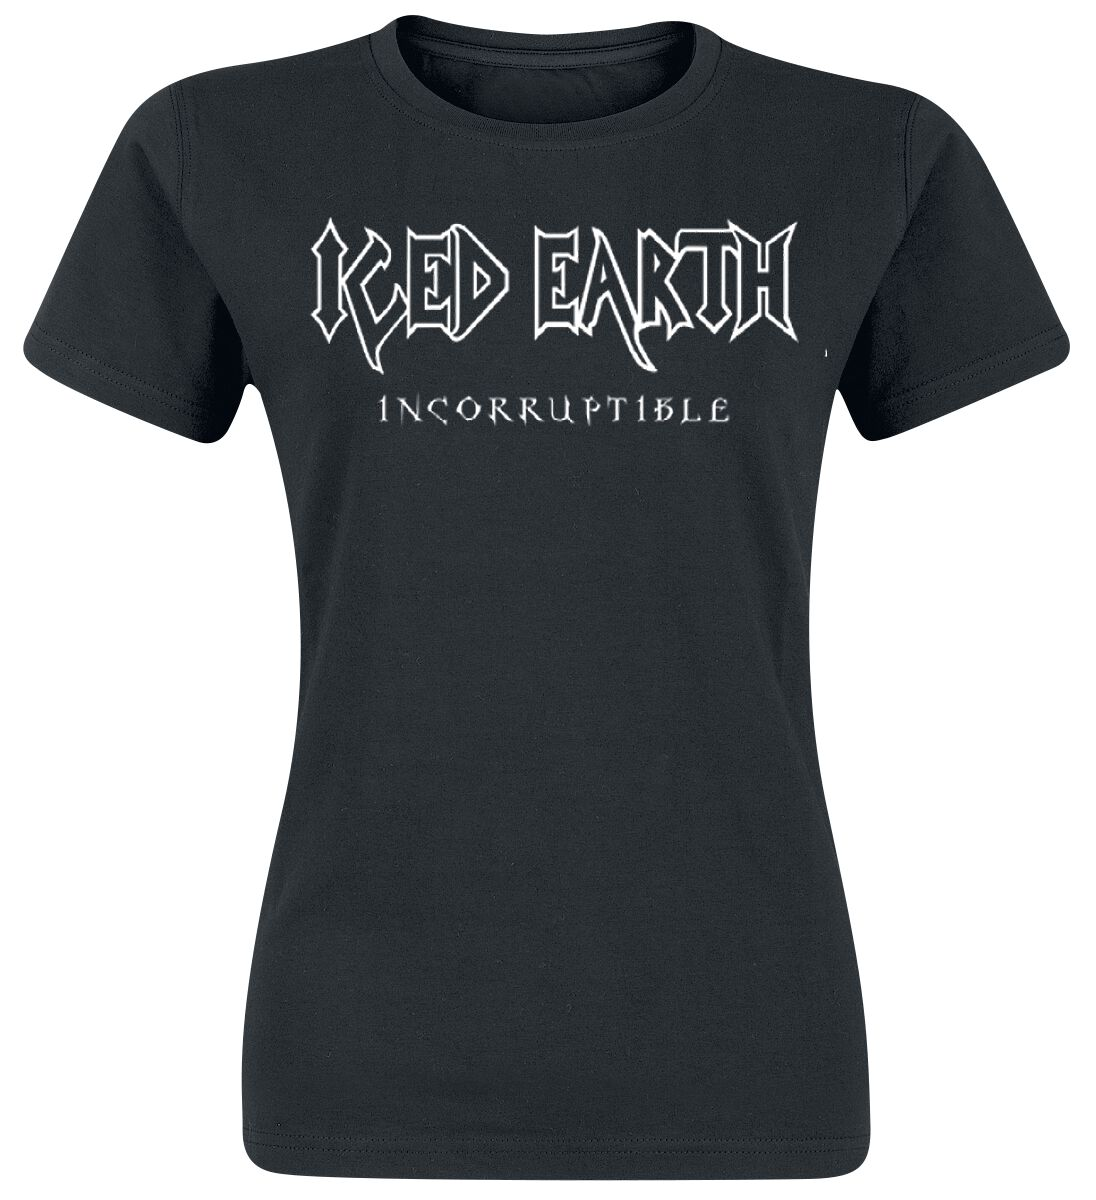 Zespoły - Koszulki - Koszulka damska Iced Earth Incorruptible Koszulka damska czarny - 362070